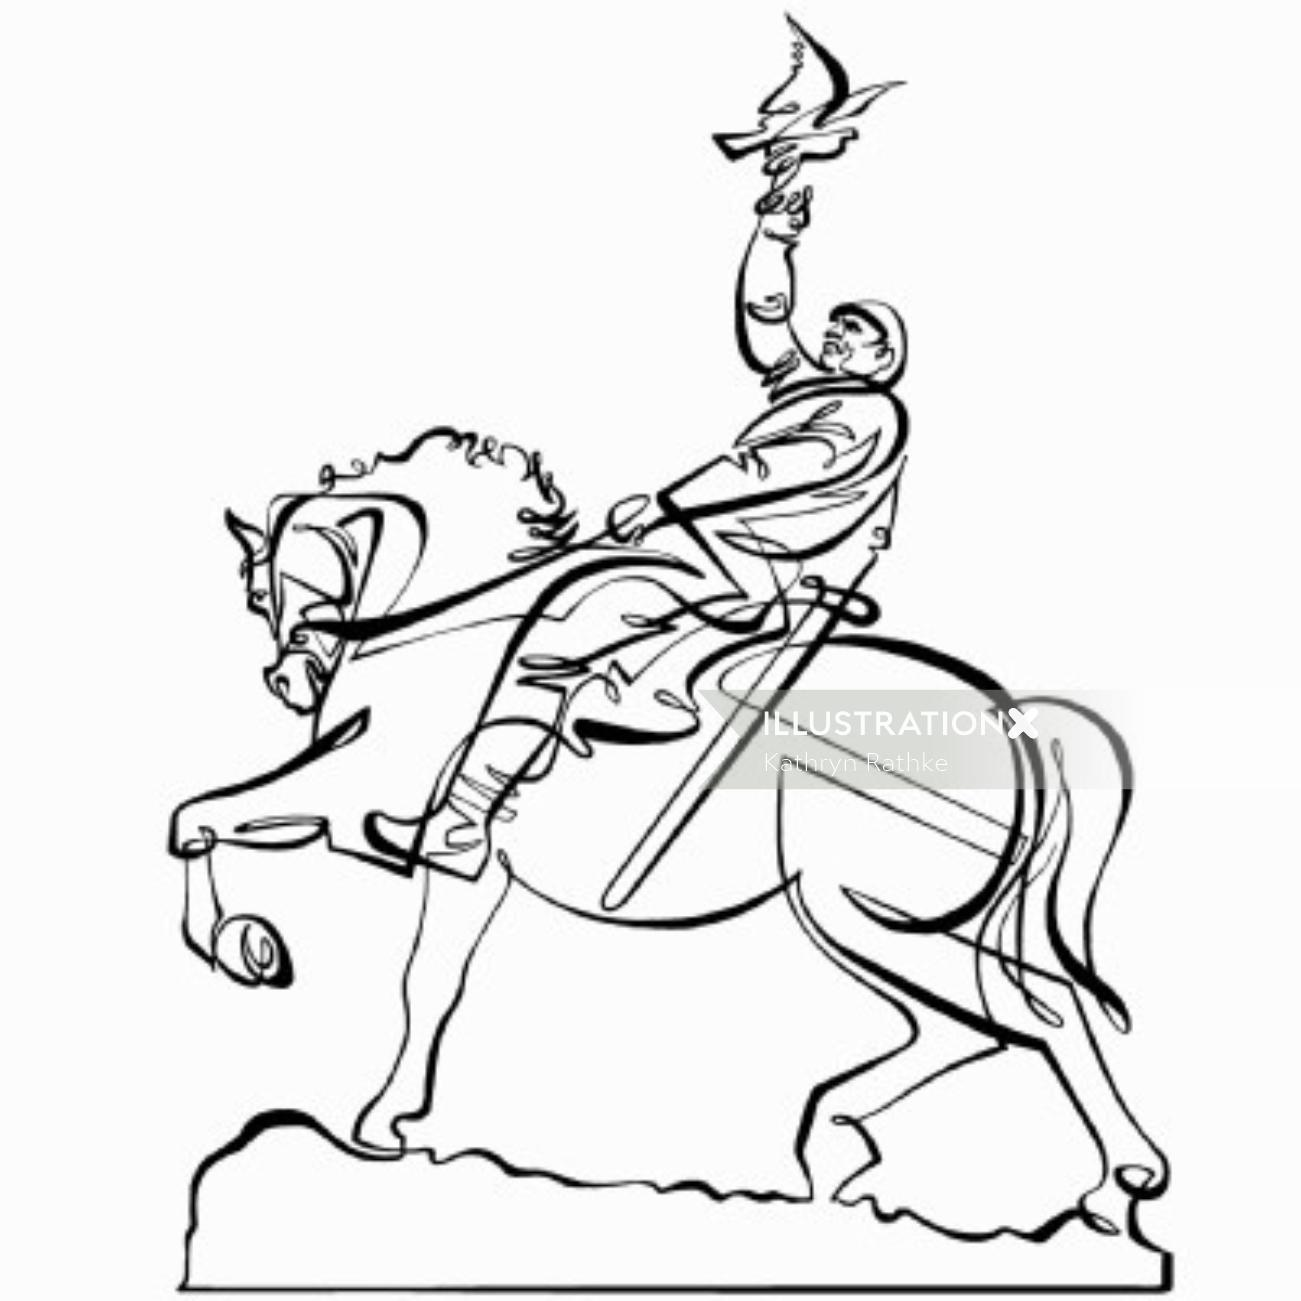 Man on Horse Line art